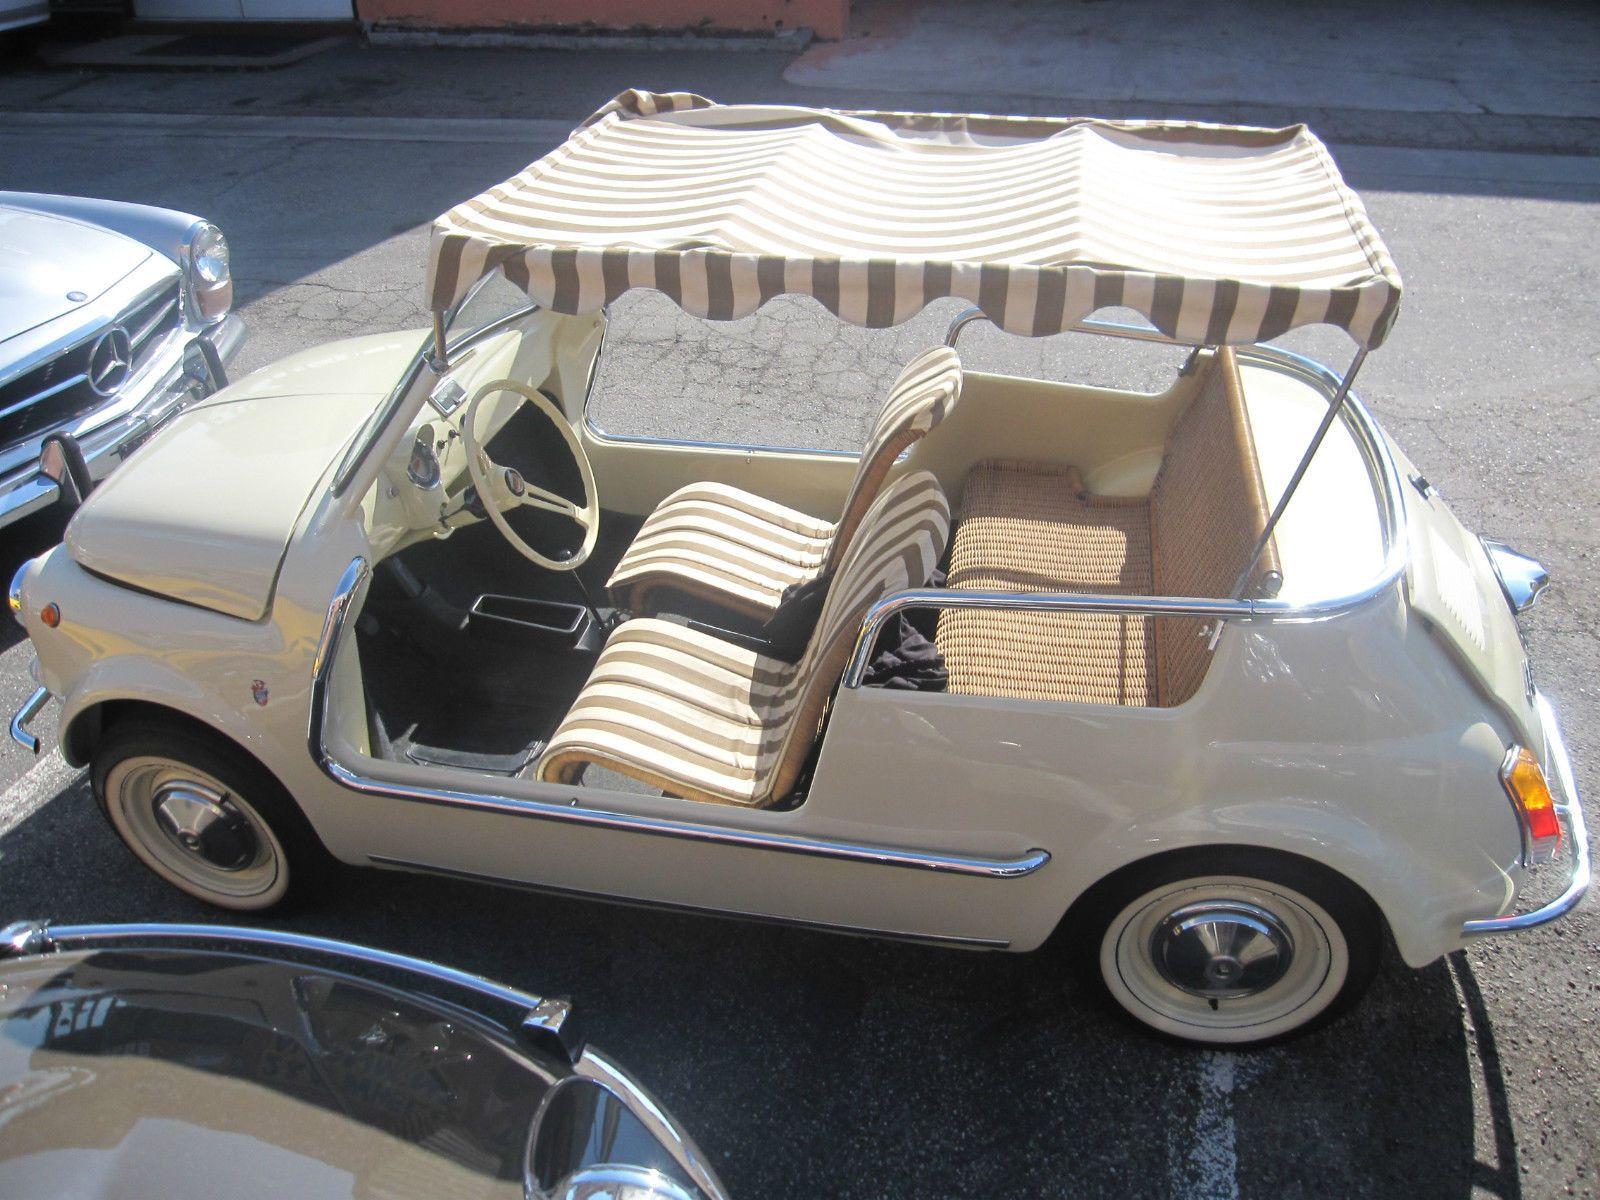 69 Fiat Jolly The Ultimate Beach Cruiser Dream Machines Beach